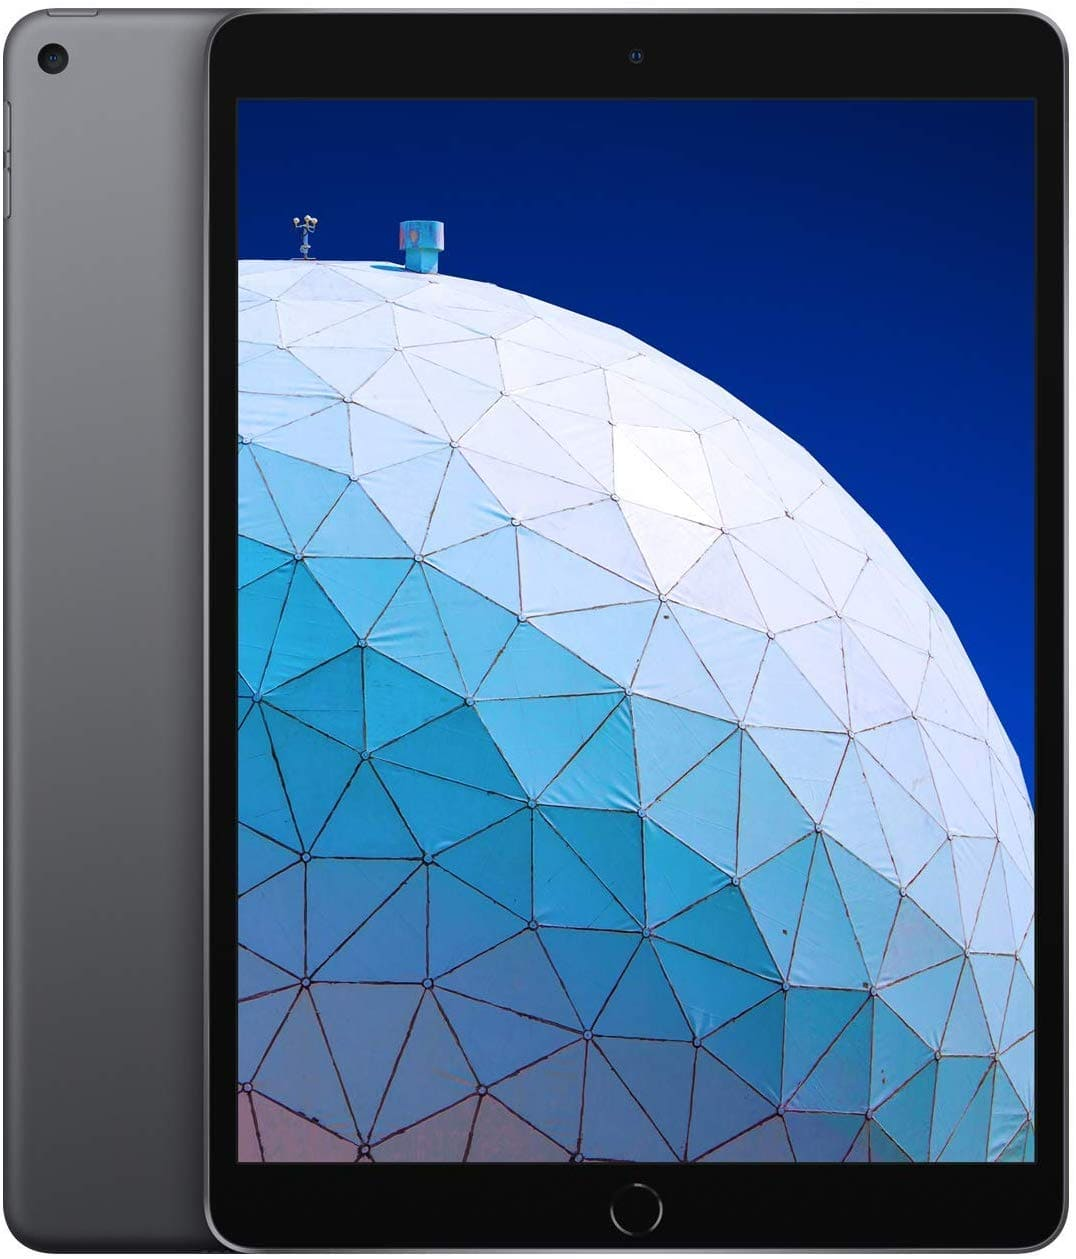 iPad Air公式画像